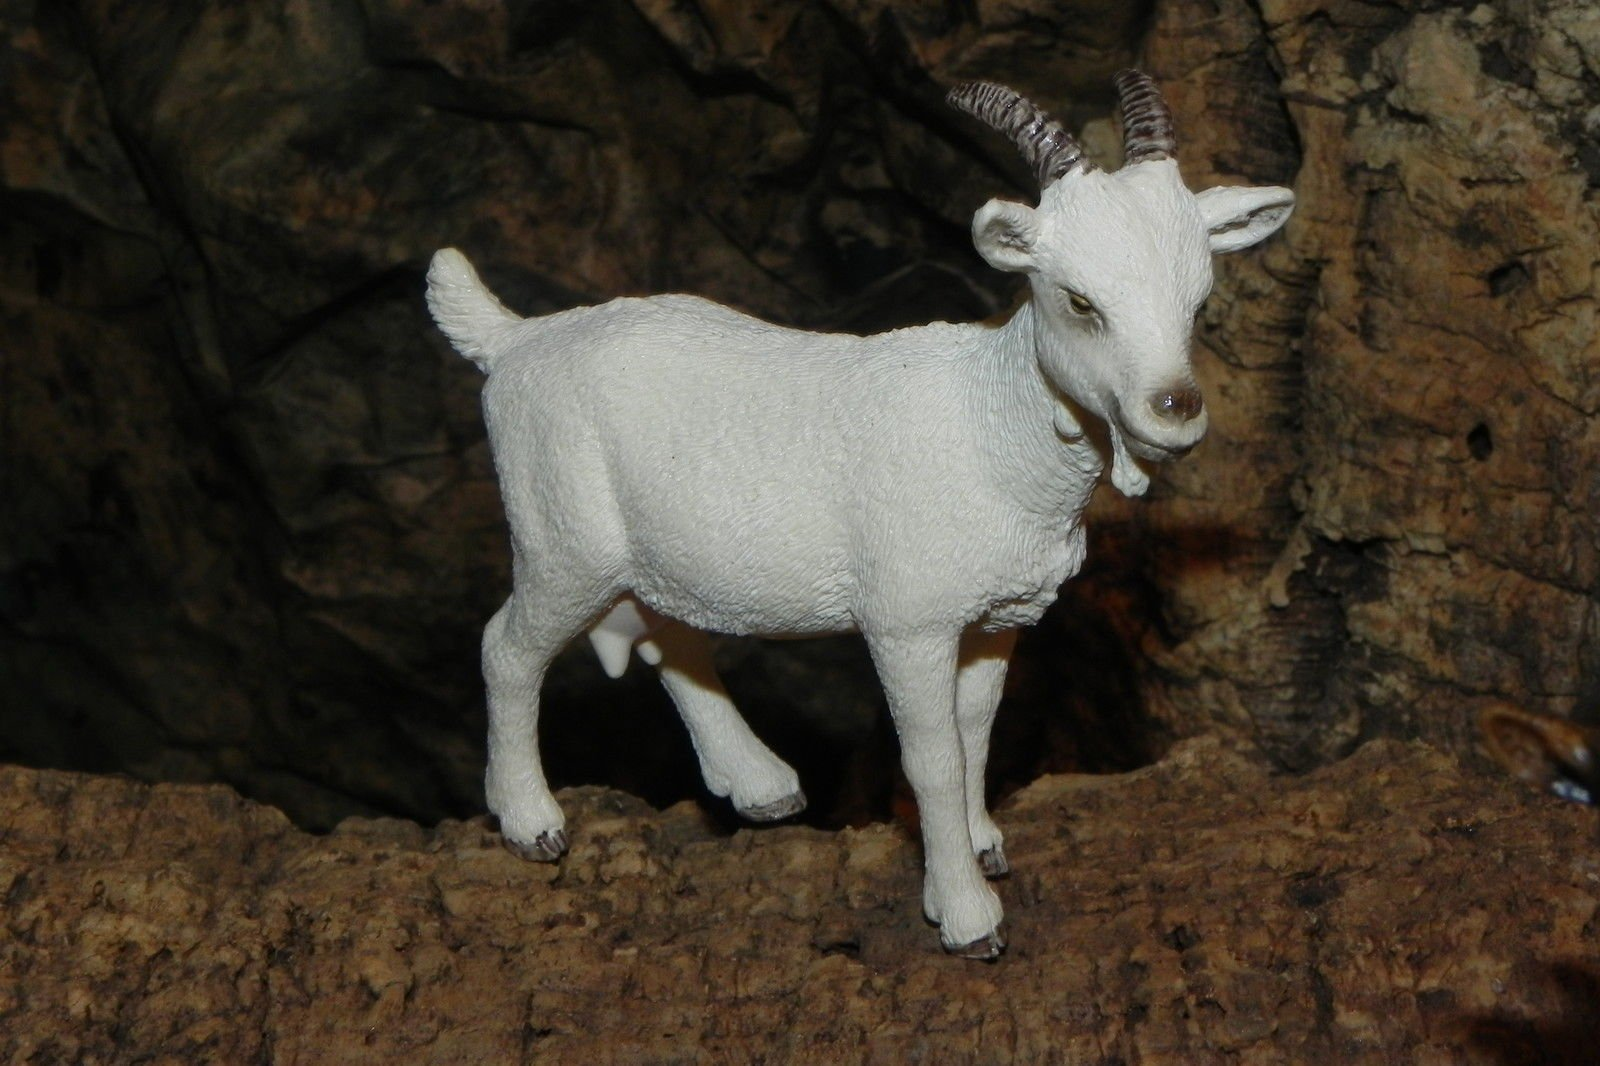 Collectible Figurine Goat Animal Nativity Scene - USA_Mall